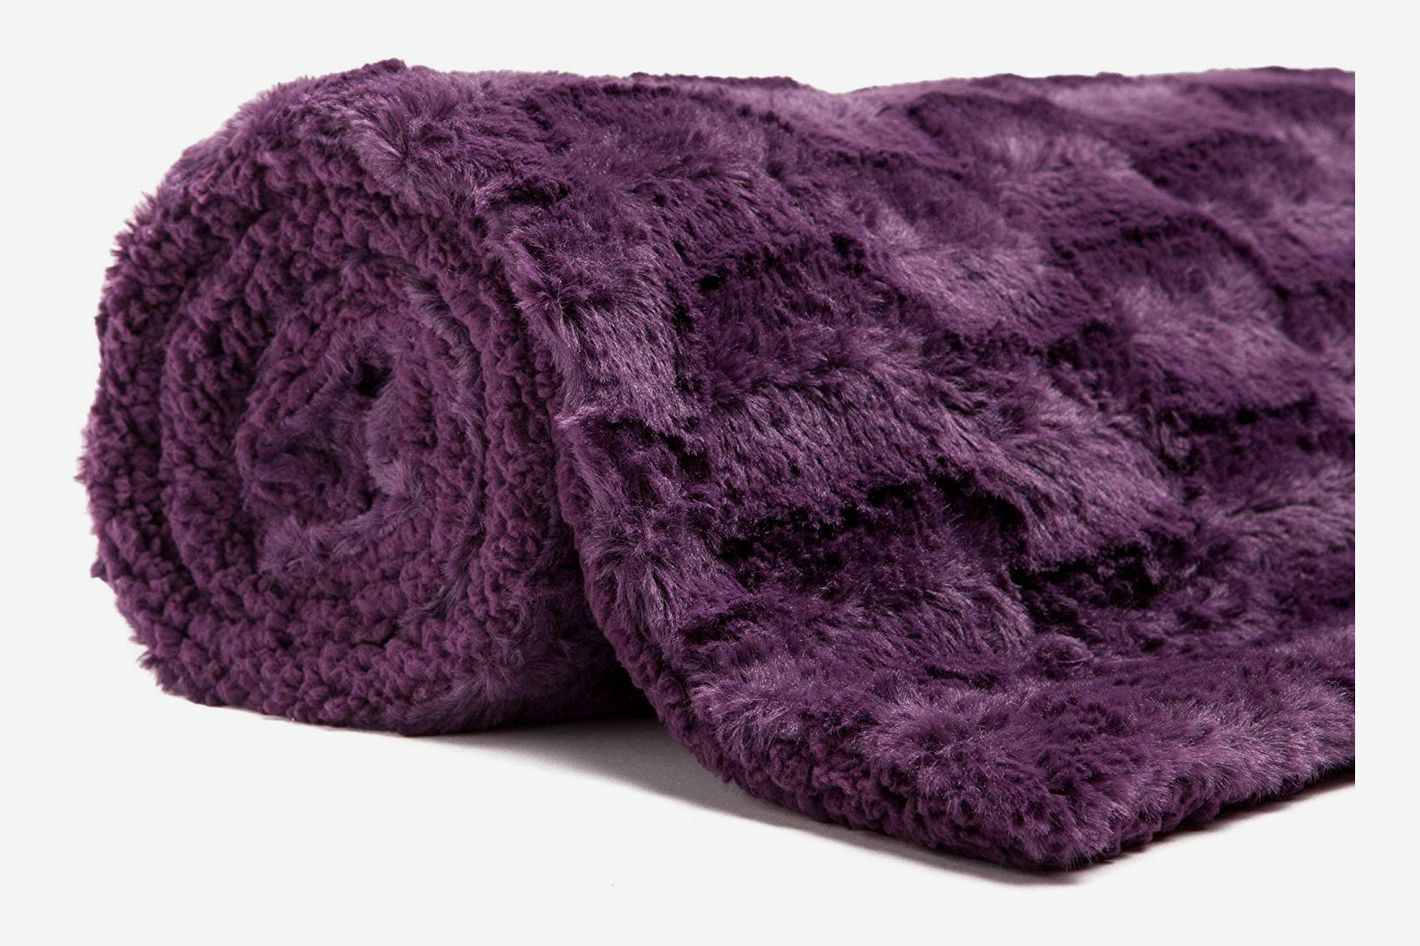 315f59e392fb99 Chanasya Super Soft Fuzzy Faux Fur Elegant Rectangular Embossed Throw  Blanket